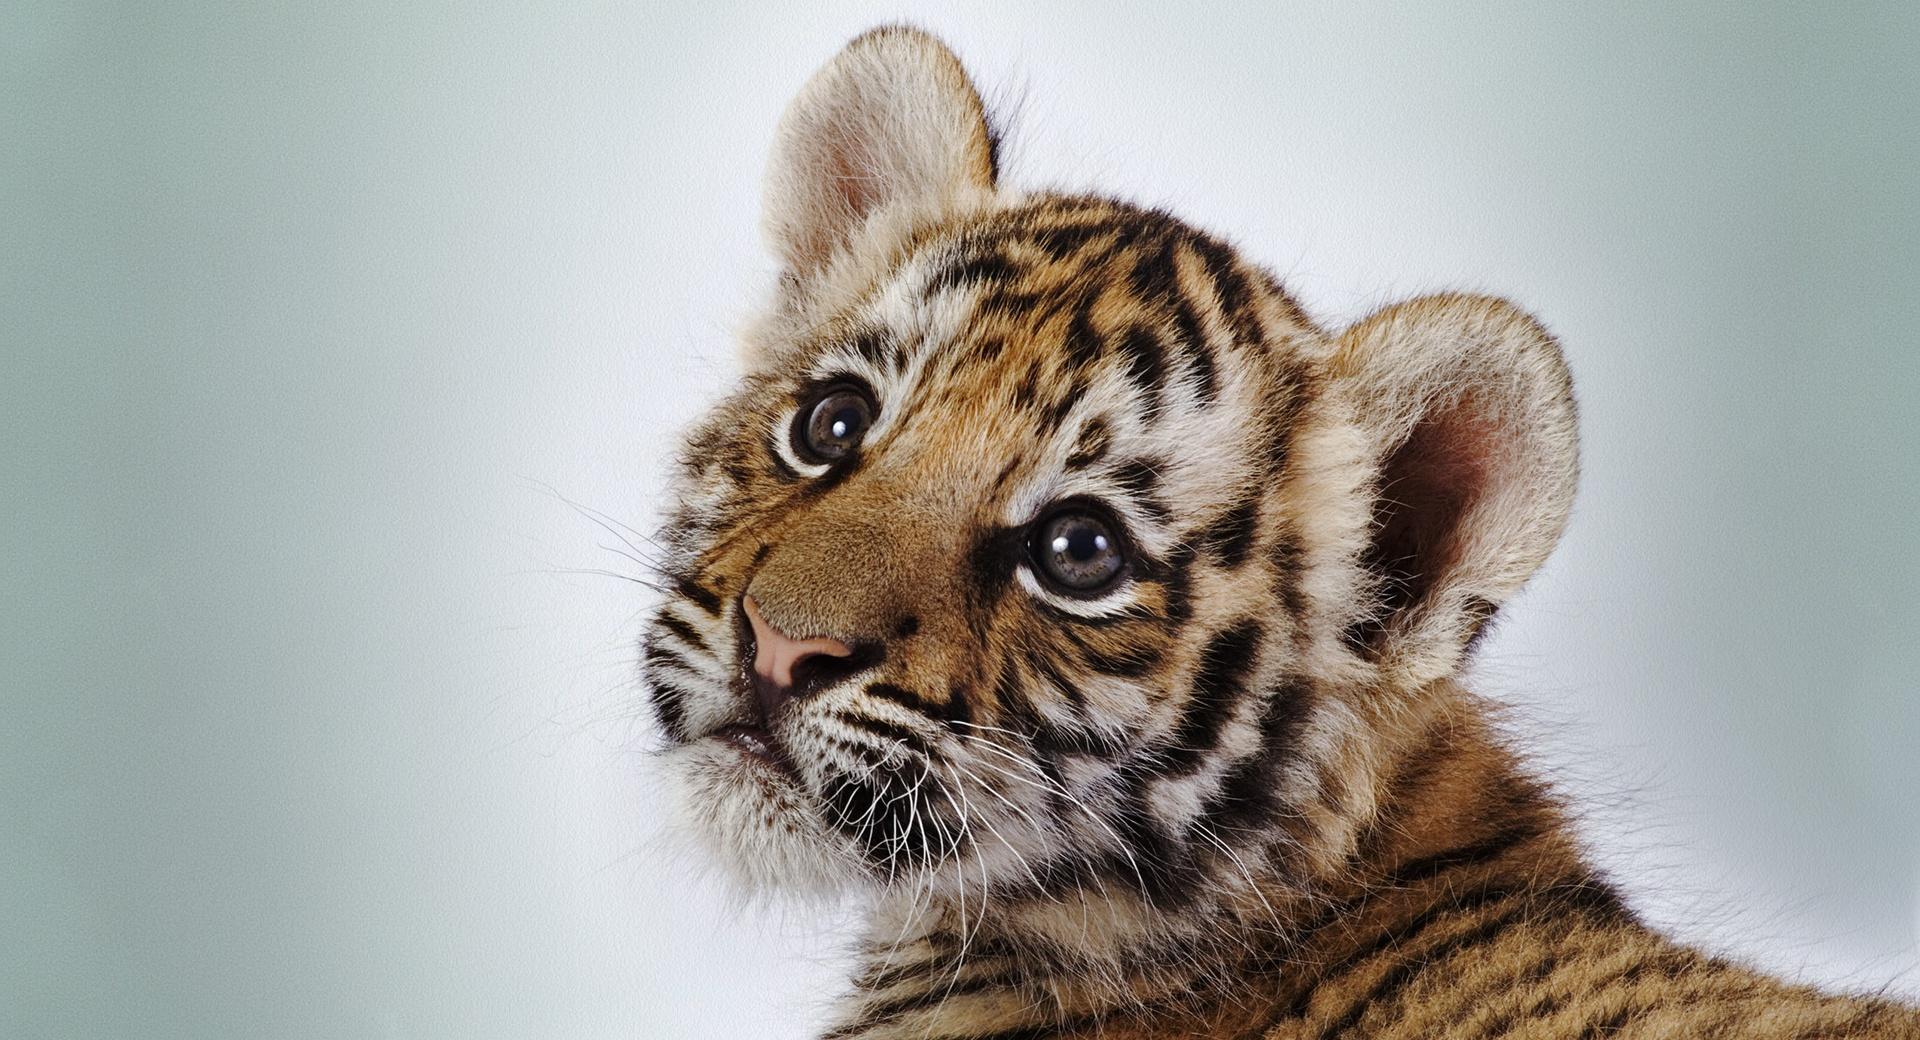 Tiger Cub wallpapers HD quality